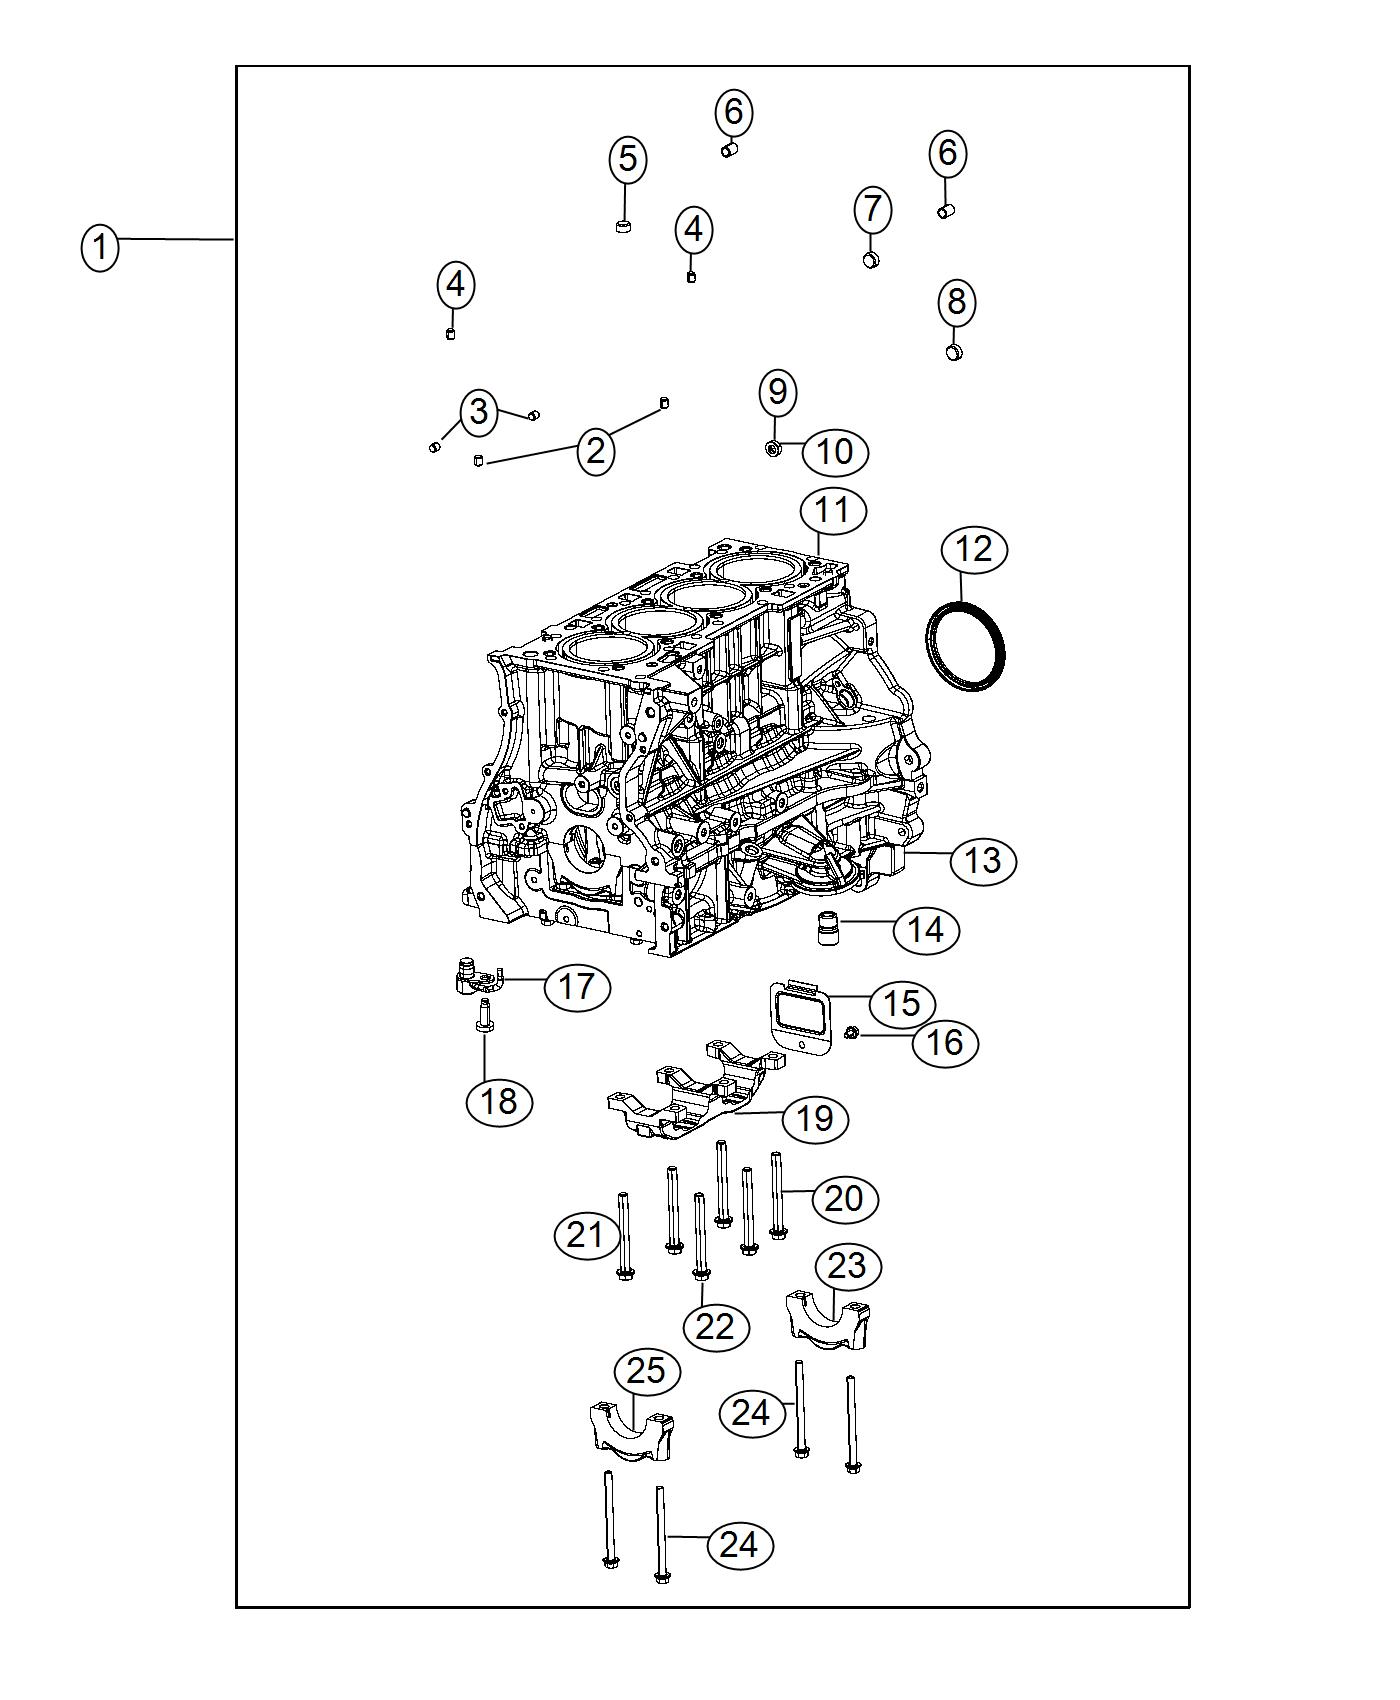 Chrysler 200 Engine Short Block Fuel Flex Train